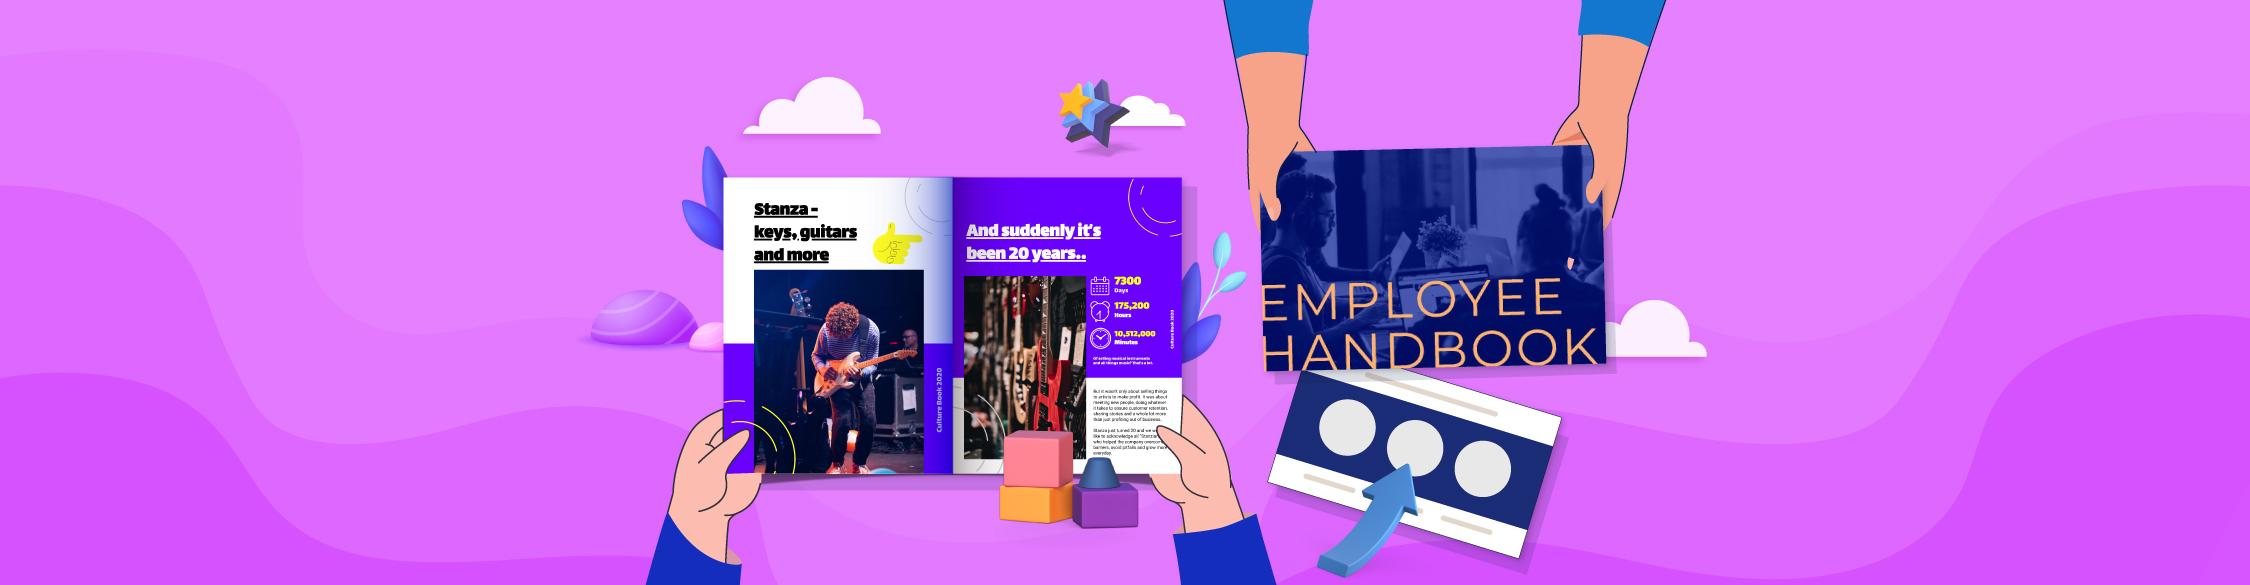 How to Create an Employee Handbook (+ Templates)